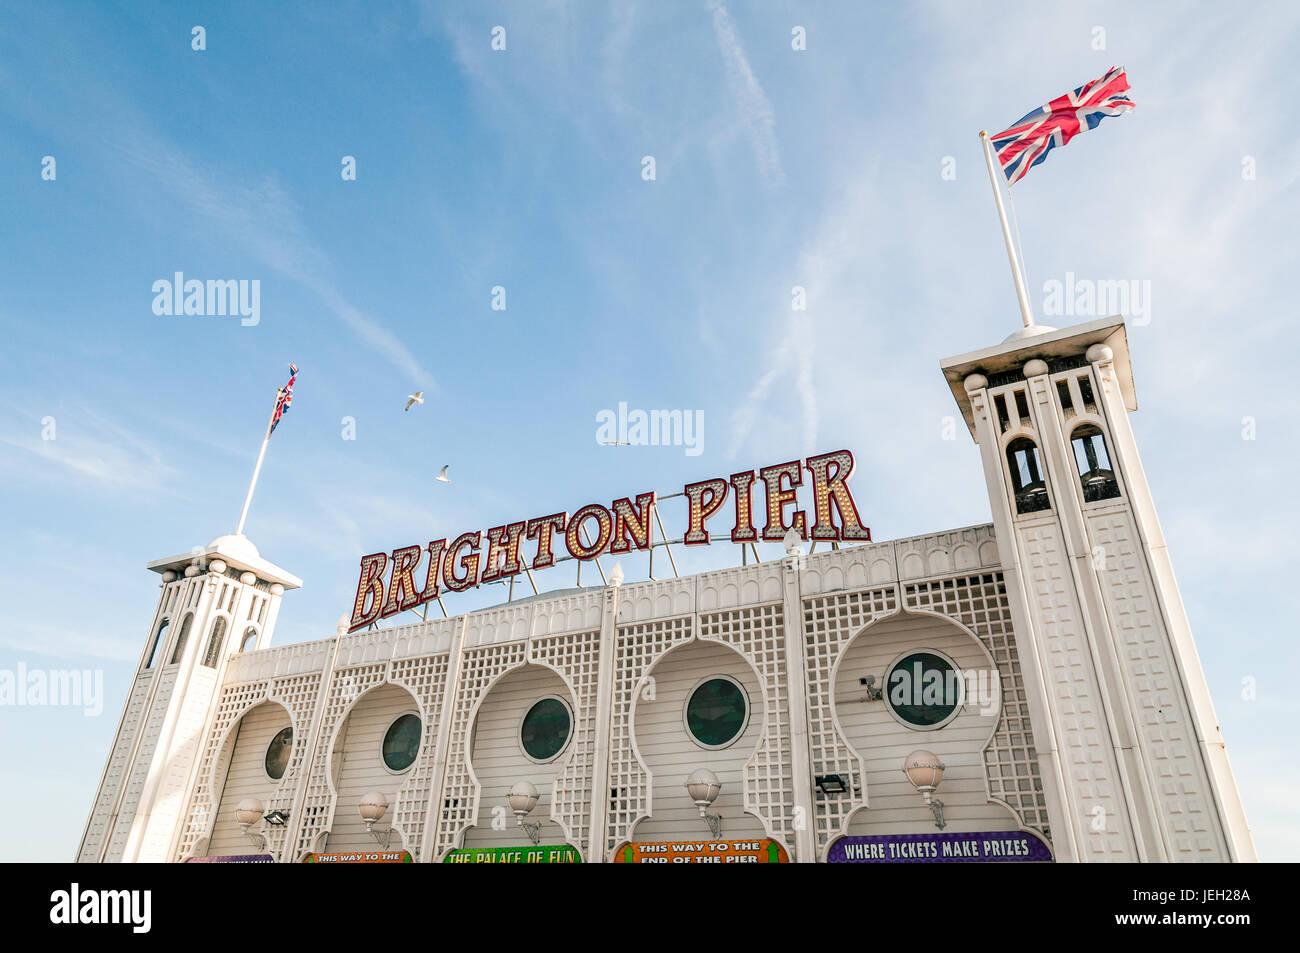 In Brighton Stock Photo